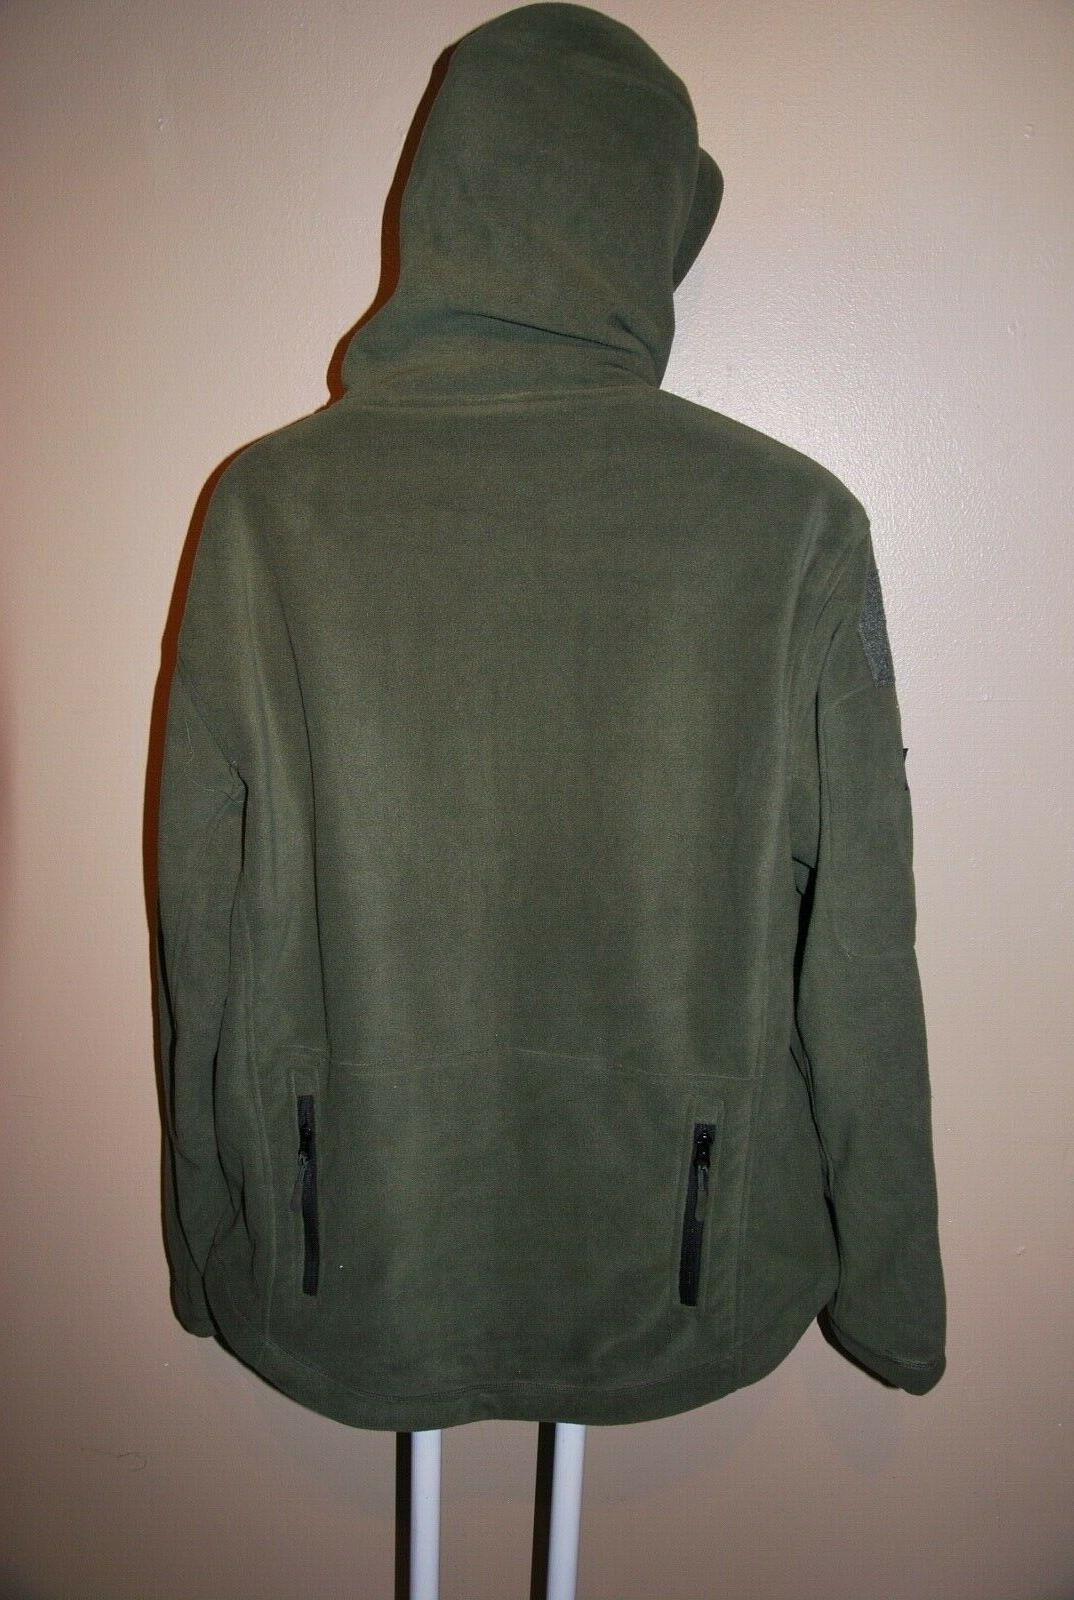 ReFire Gear Tactical Jacket Thermal Hoodie Jackets